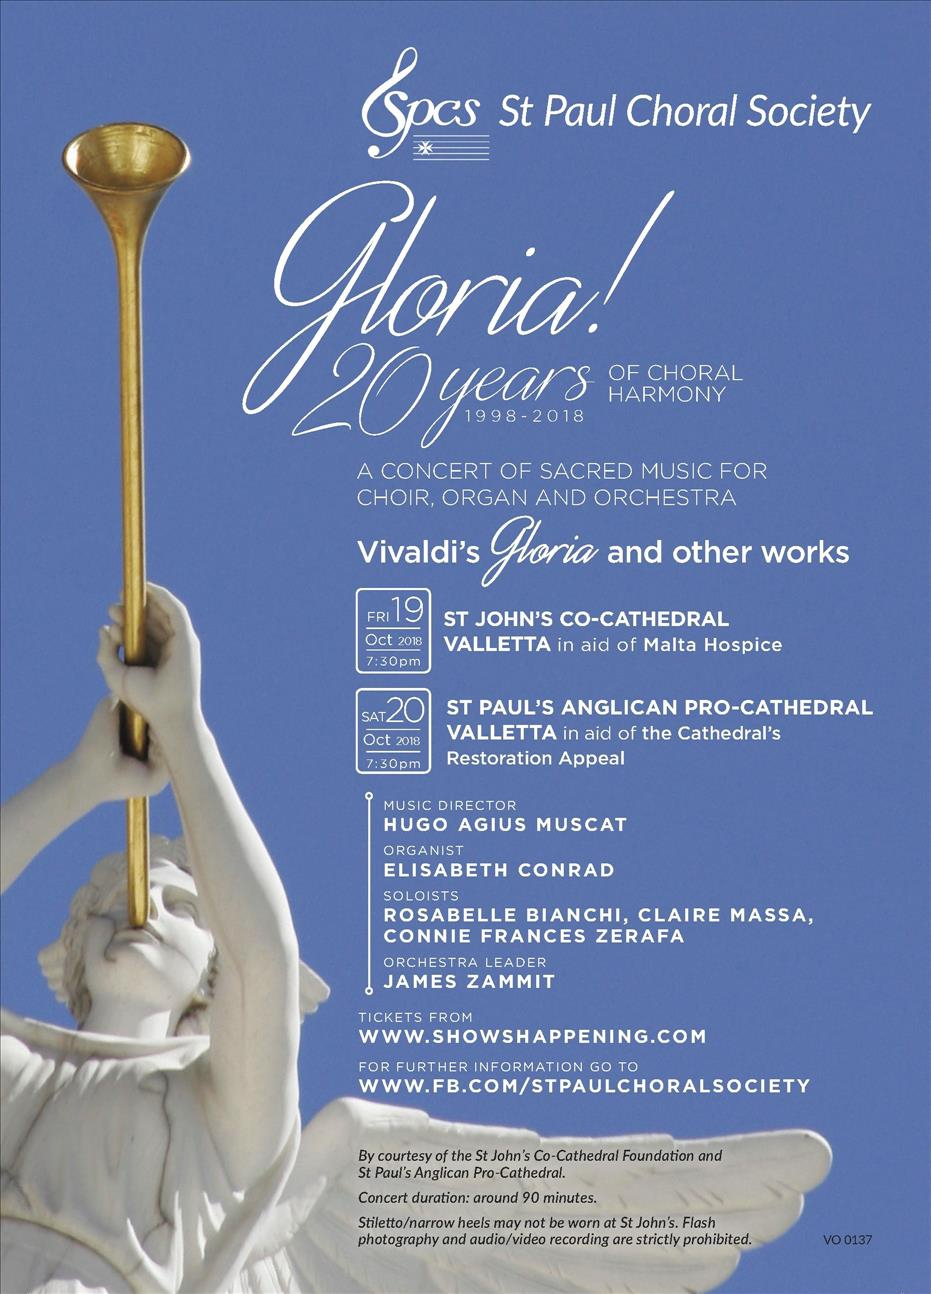 GLORIA! 20 years of Choral Harmony